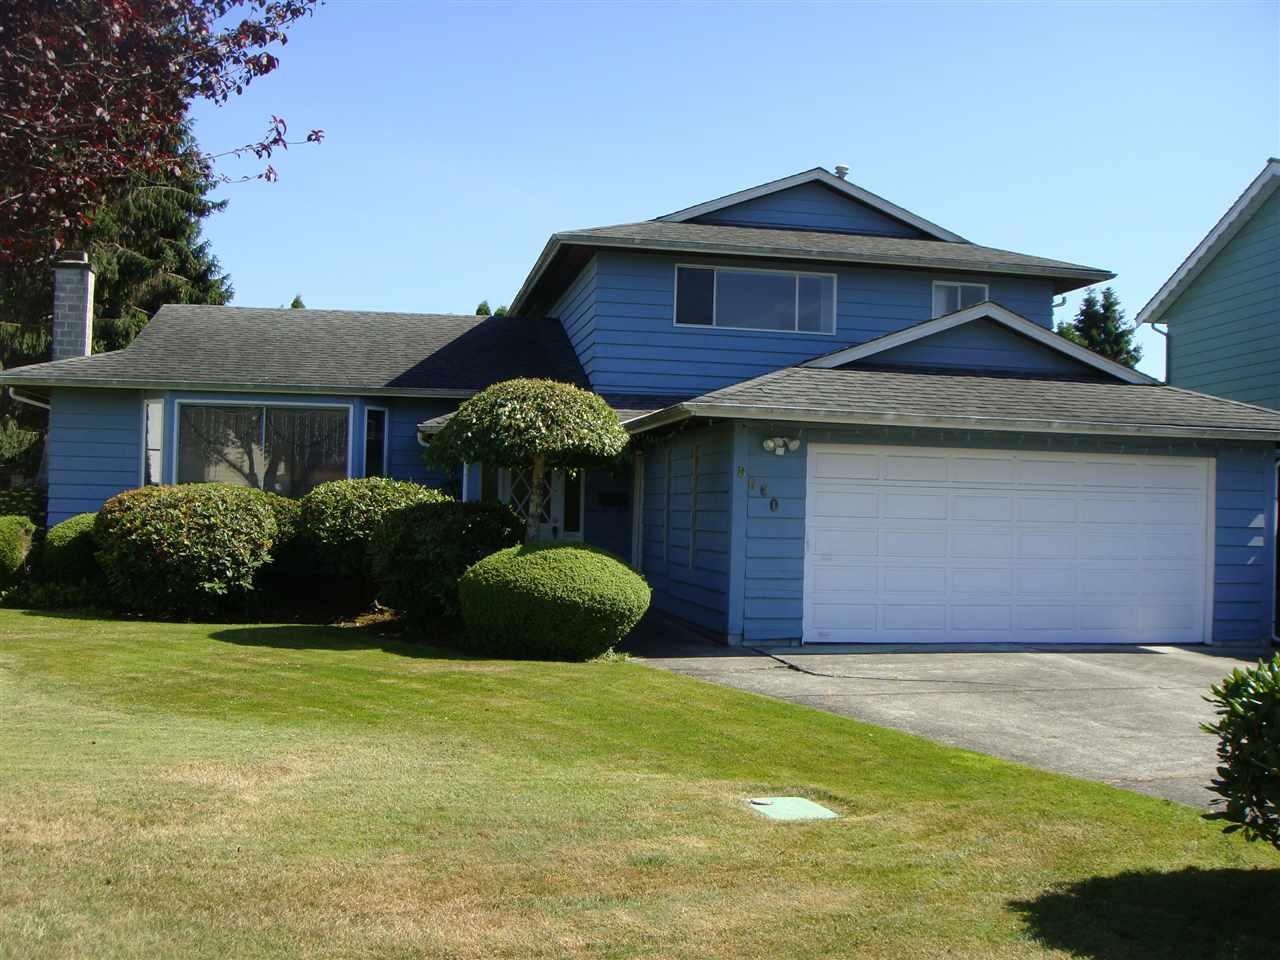 Detached at 8660 DEMOREST DRIVE, Richmond, British Columbia. Image 1